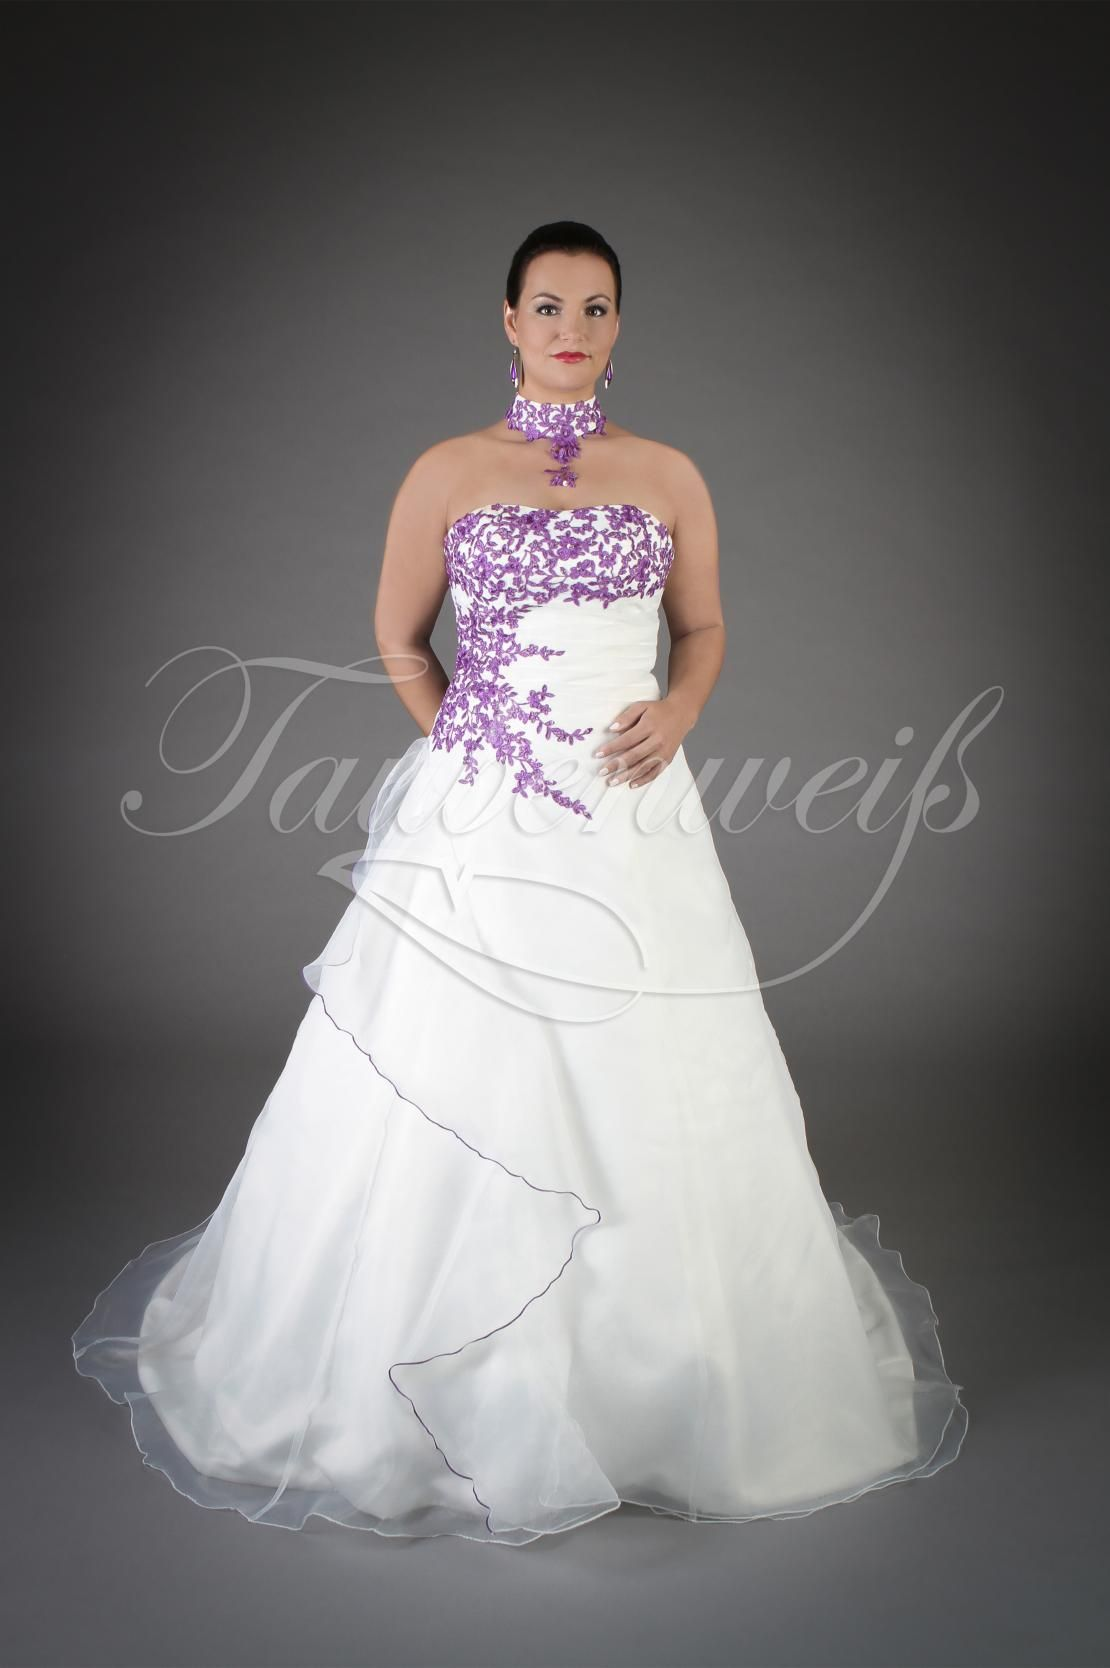 Brautkleid TW20B - A-Linie lila Organza Spitze Perlen Schleppe